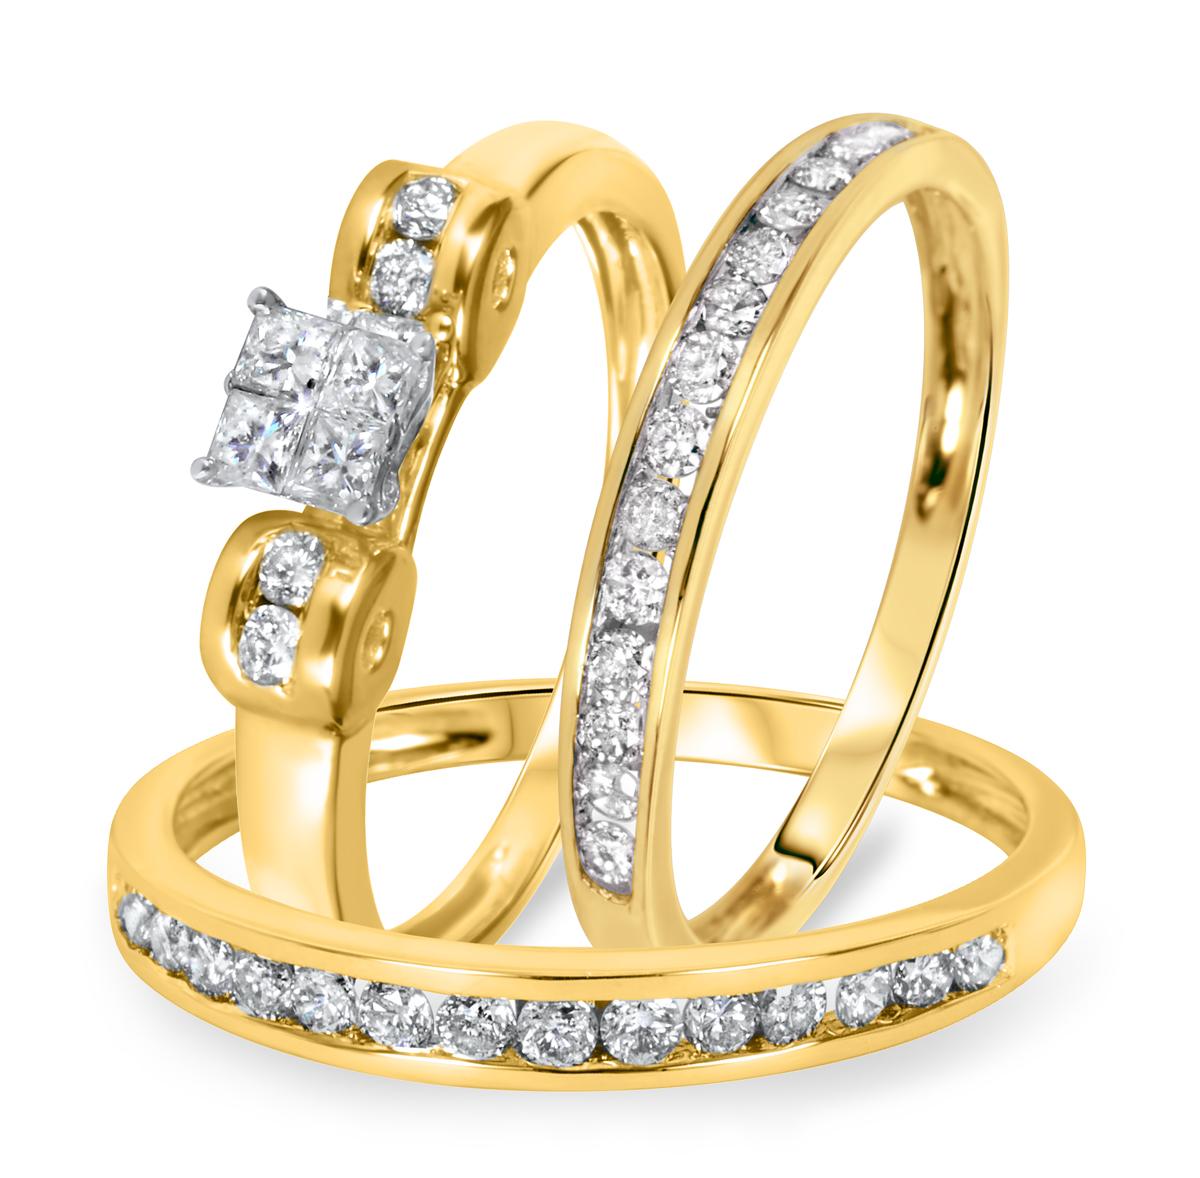 1 CT. T.W. Diamond Ladies Engagement Ring, Wedding Band, Men's Wedding Band